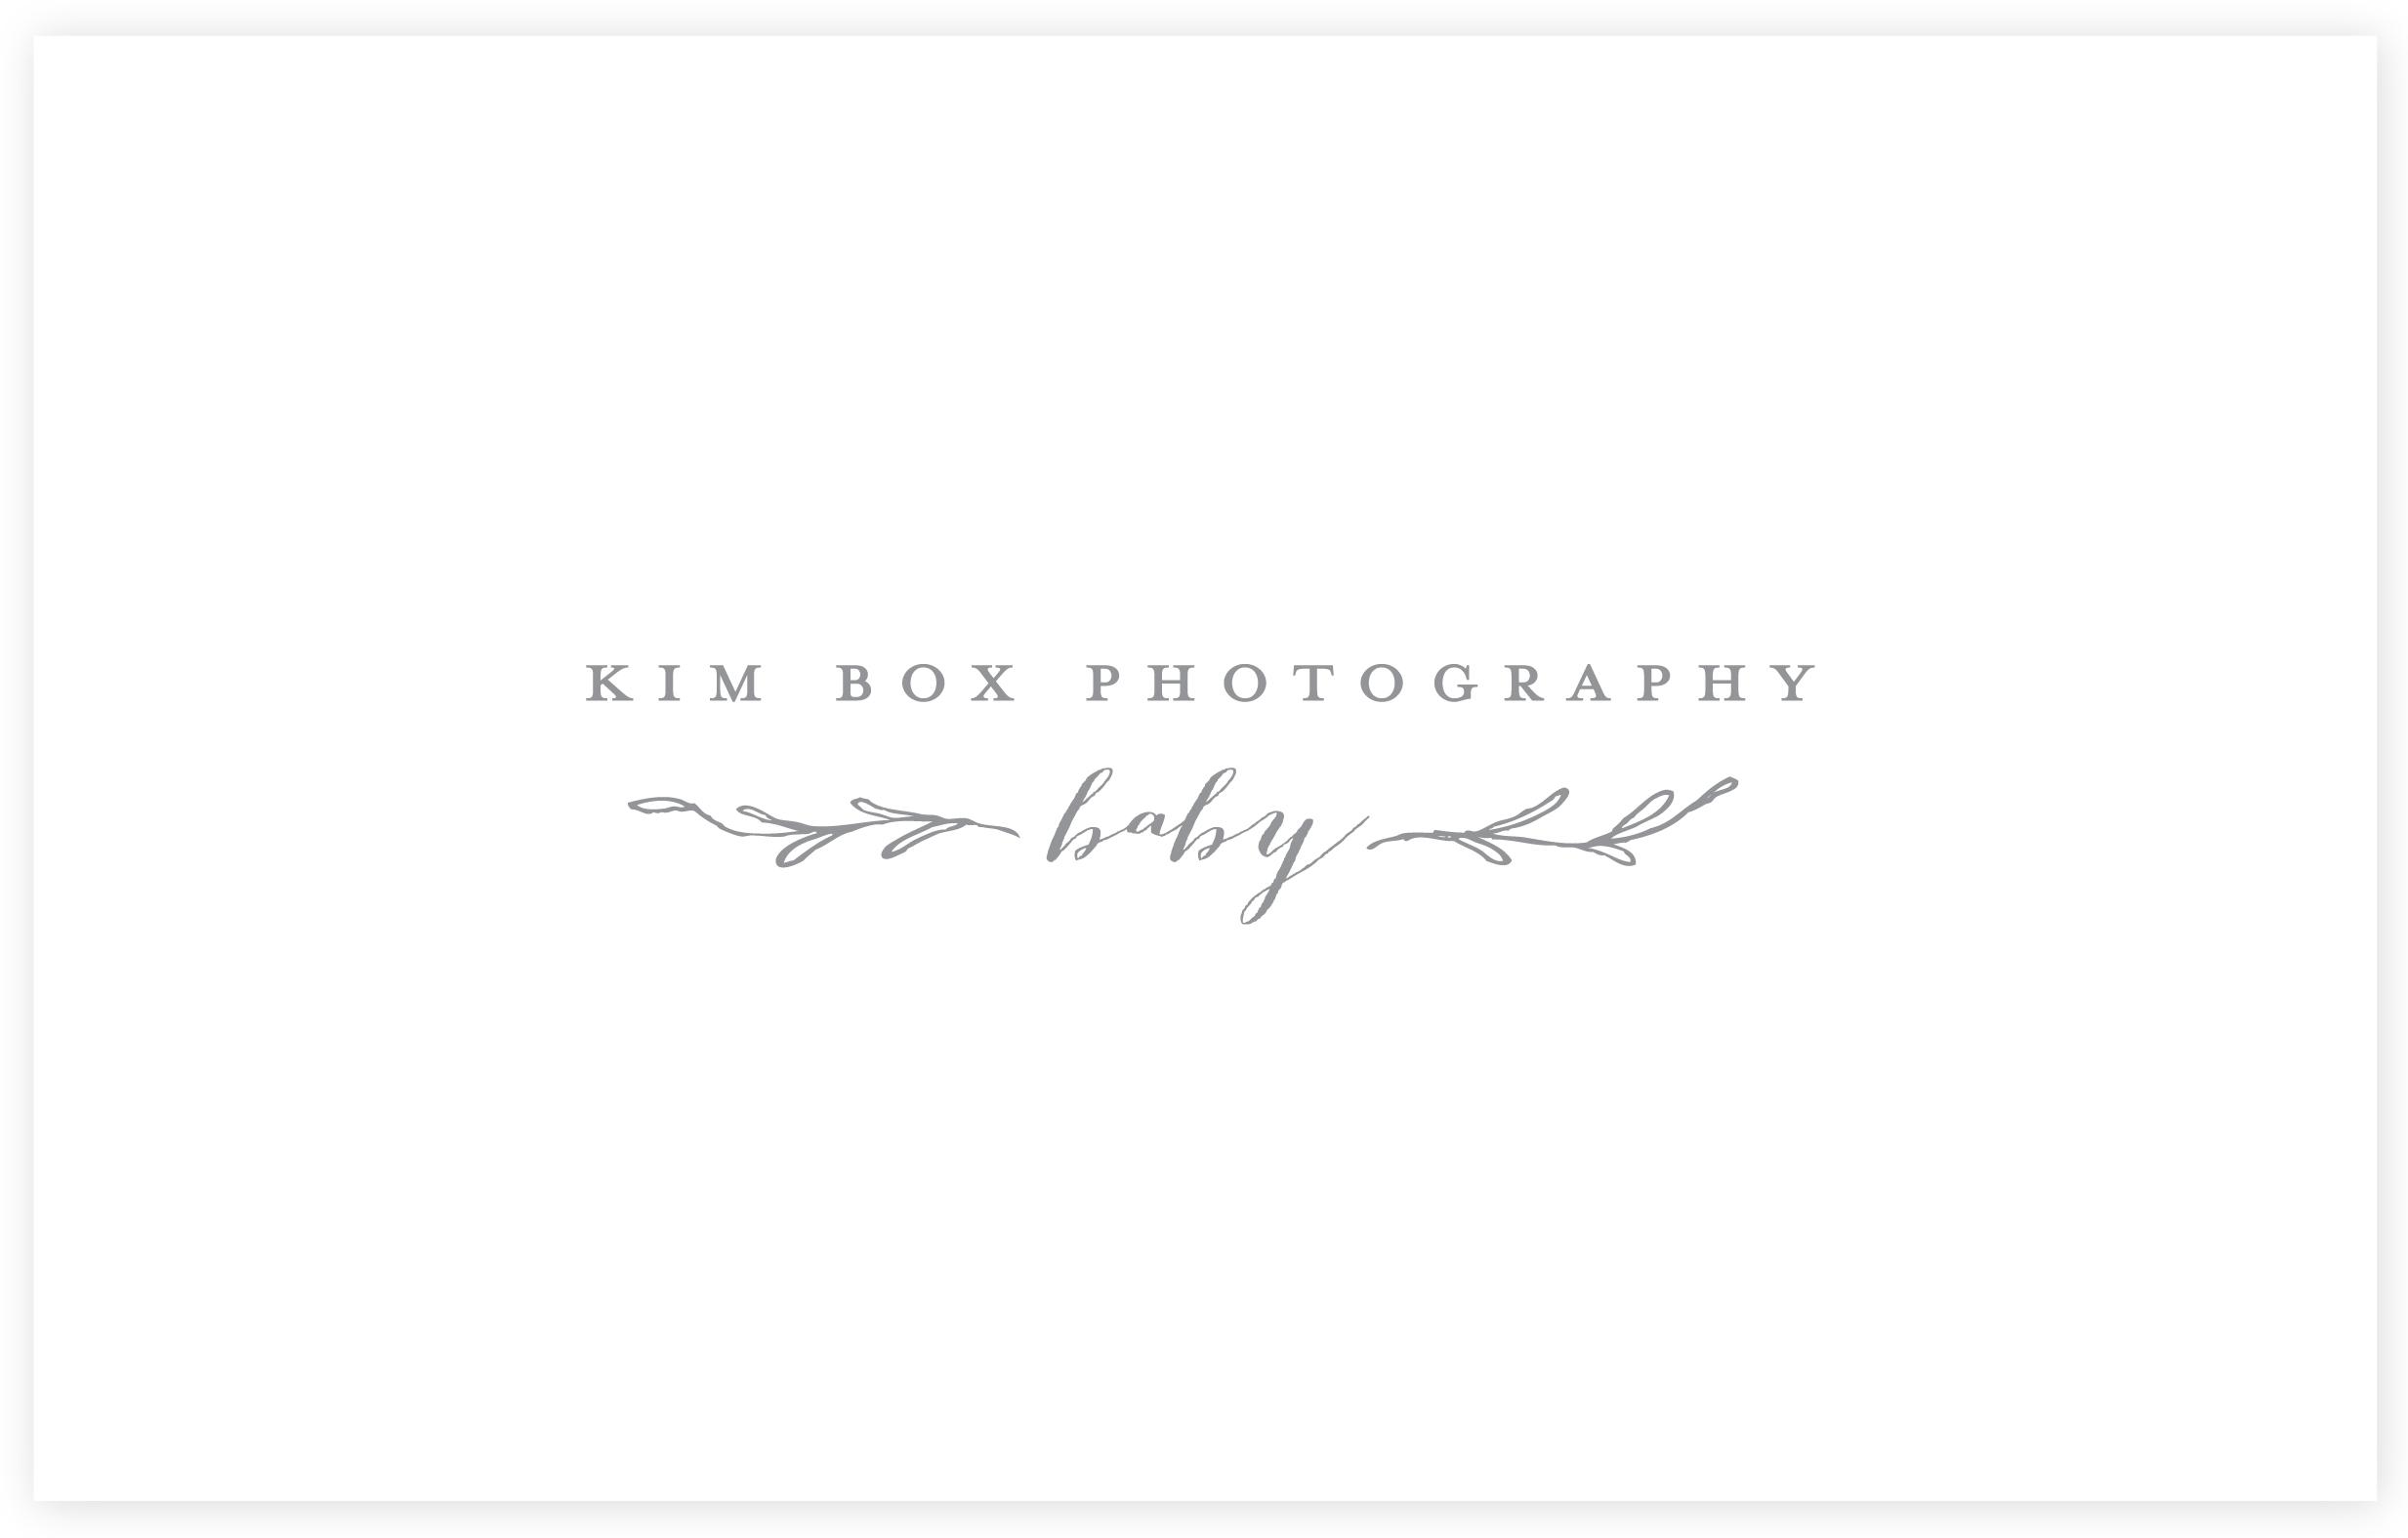 KBB_logo2.jpg